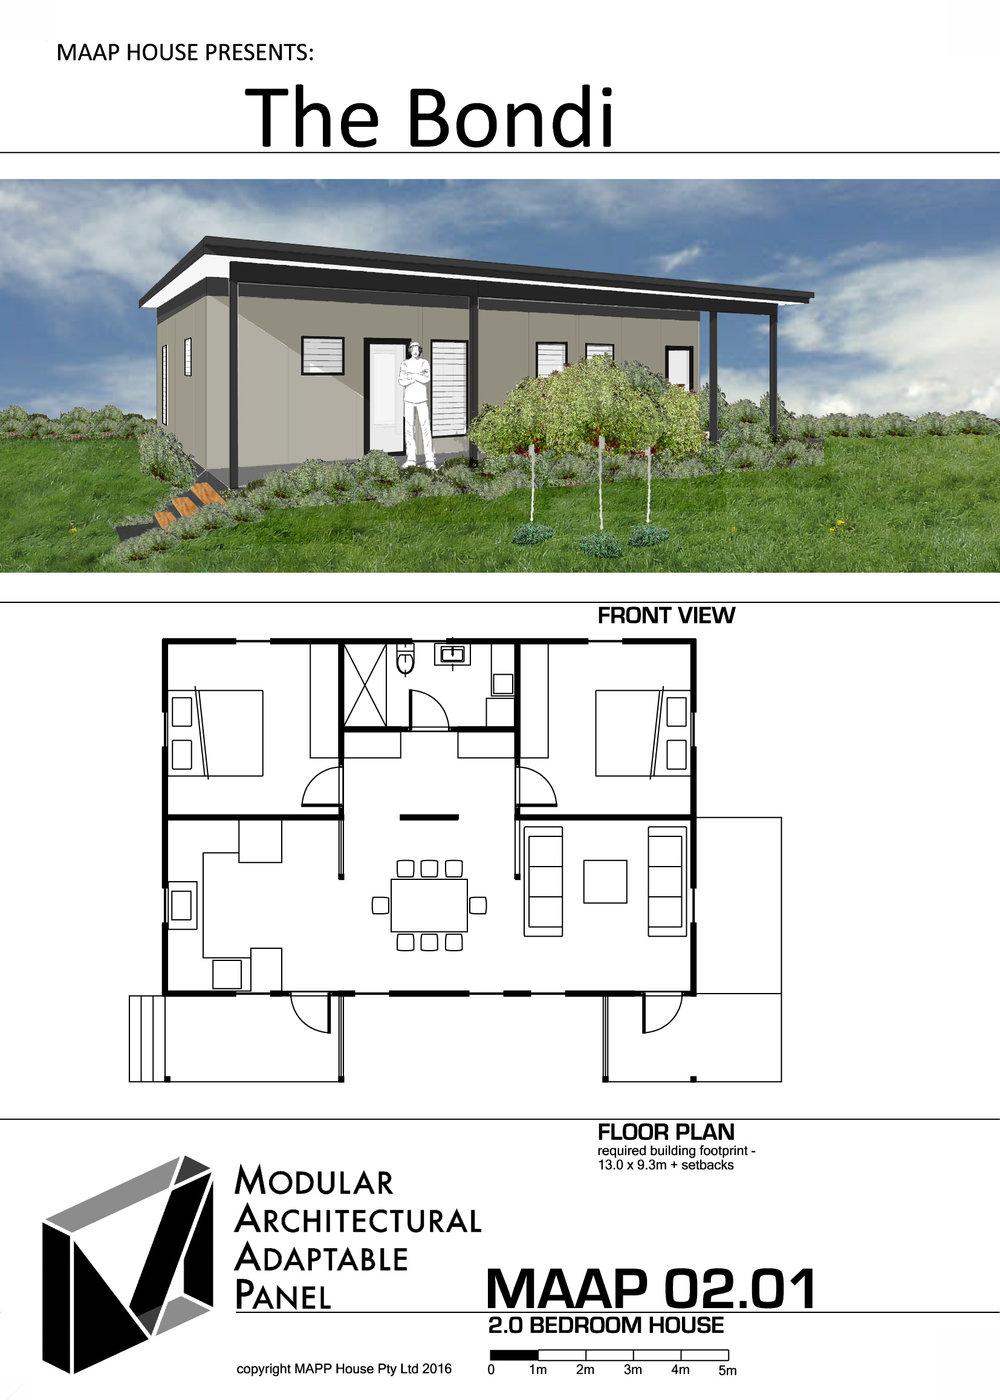 MAAP House